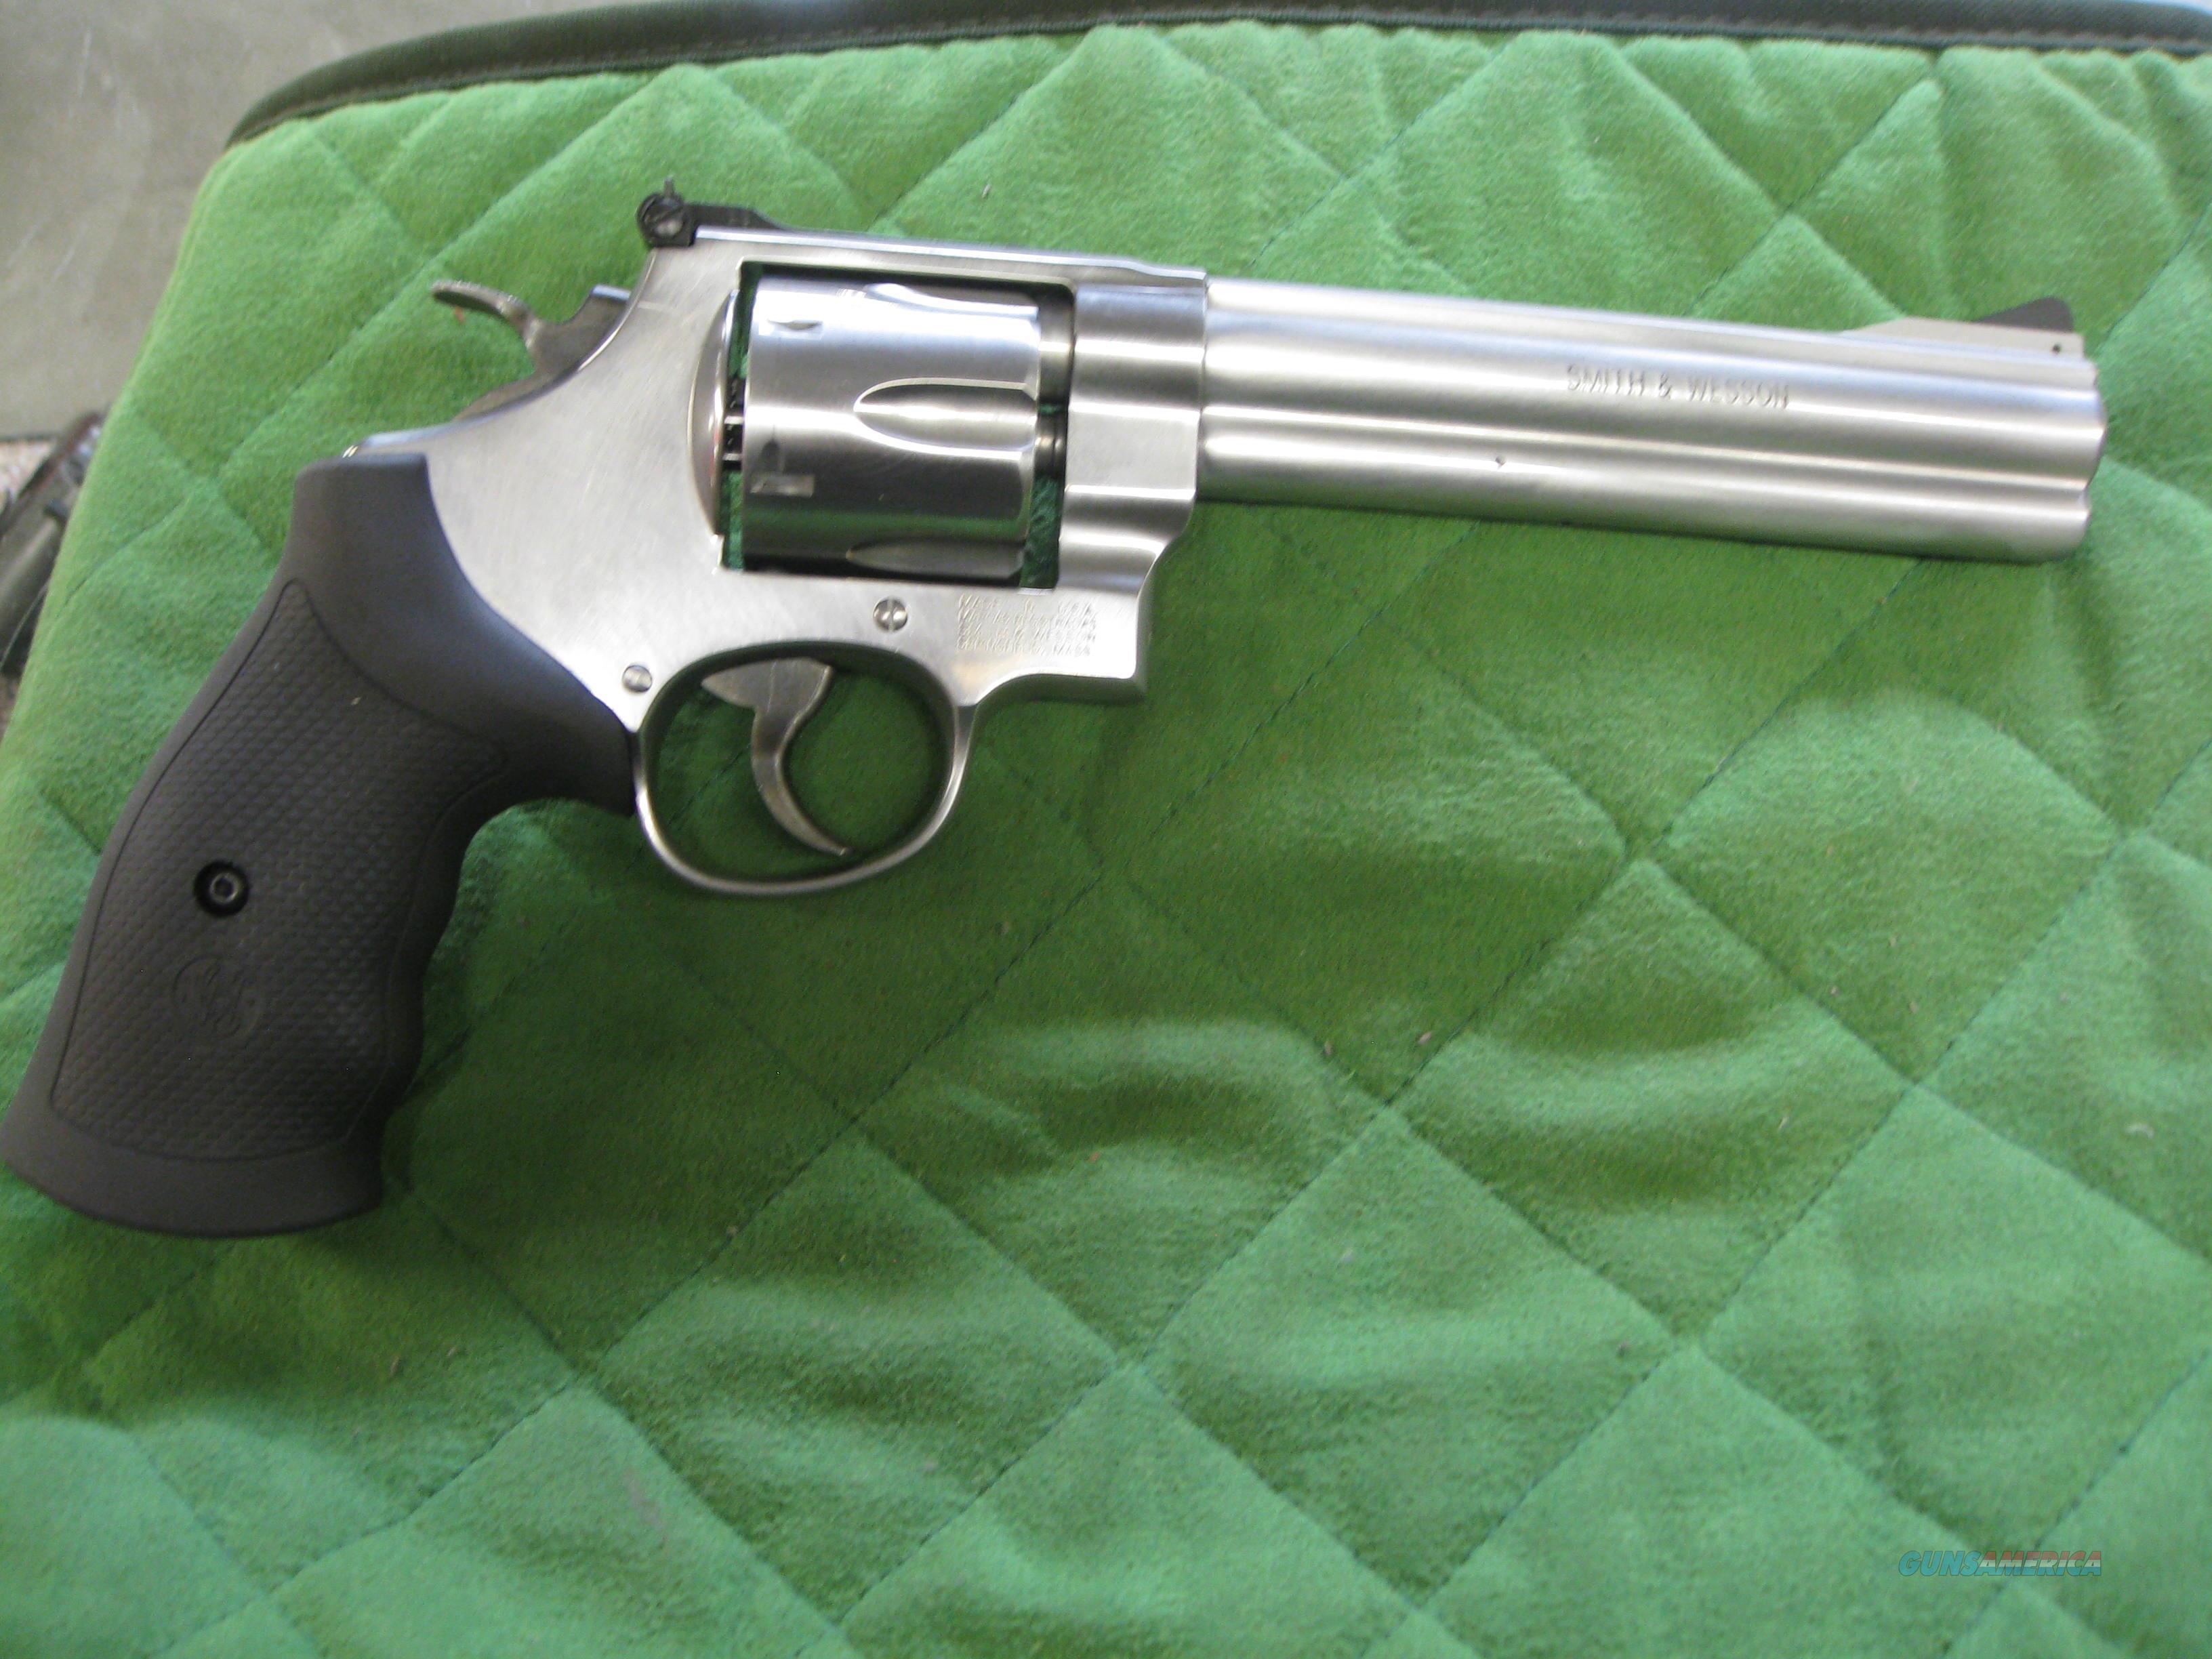 "Smith & Wesson 610 6"" 10mm 12462 NO CC FEES  Guns > Pistols > Smith & Wesson Revolvers > Full Frame Revolver"